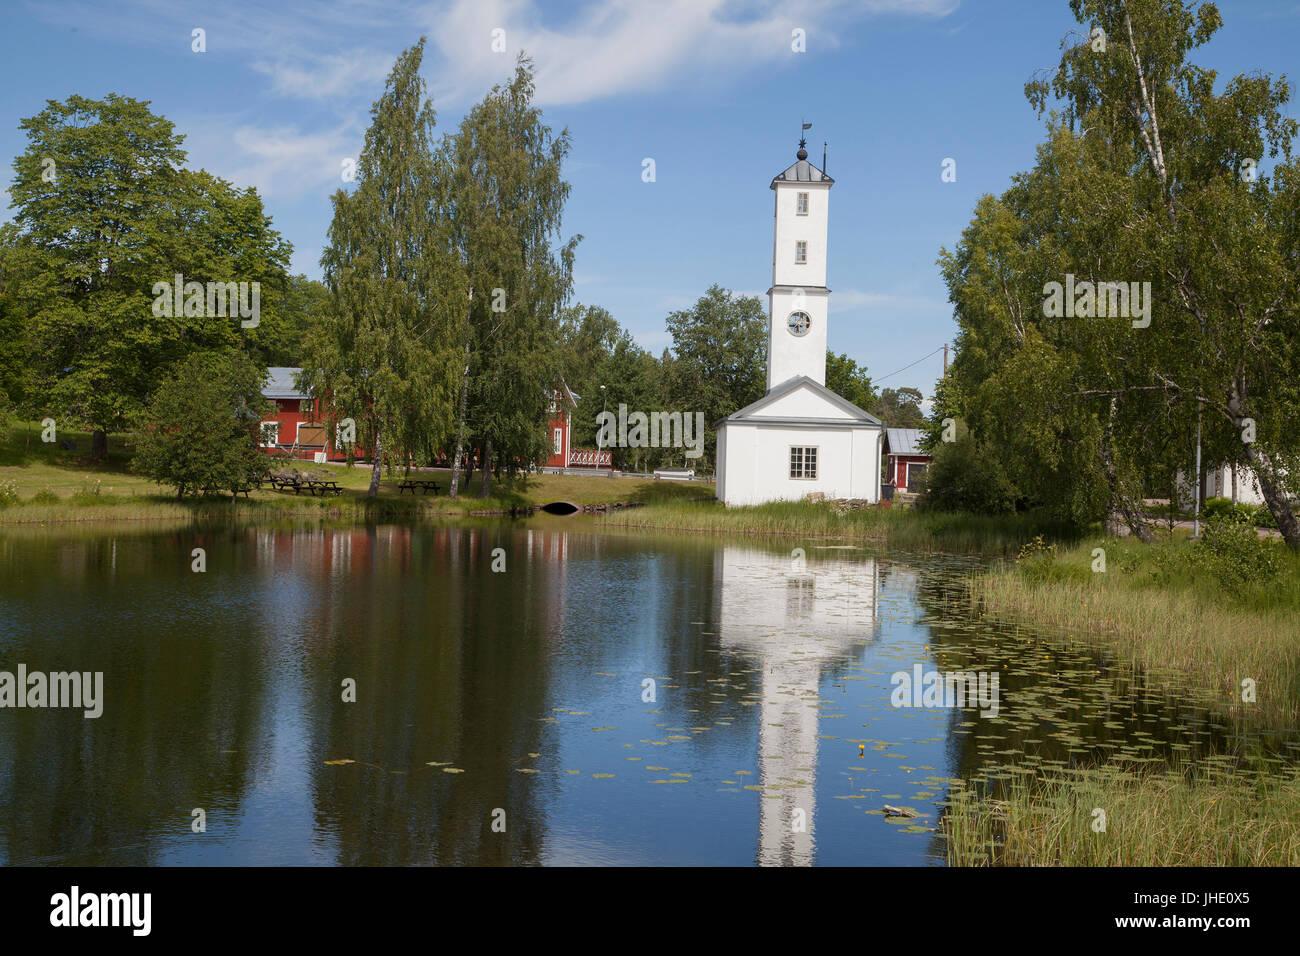 STJÄRNSUND Dalarna Sweden - Stock Image